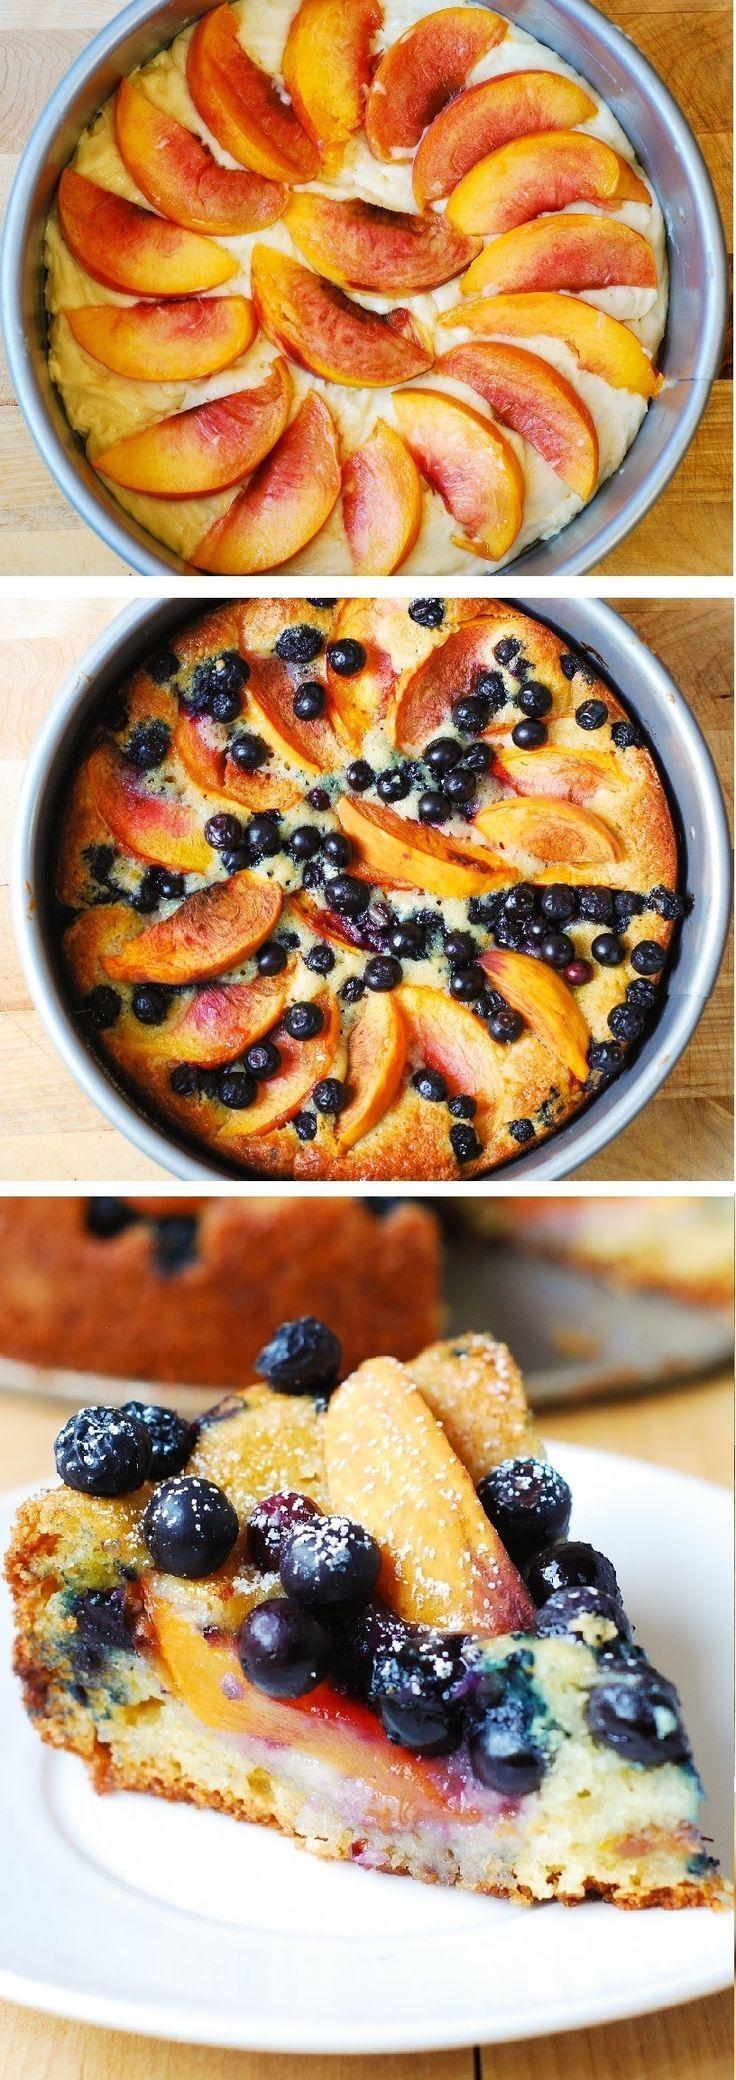 Delicious, Light and Fluffy Peach Blueberry Greek Yogurt Cake #greekyogurt #cake #berries